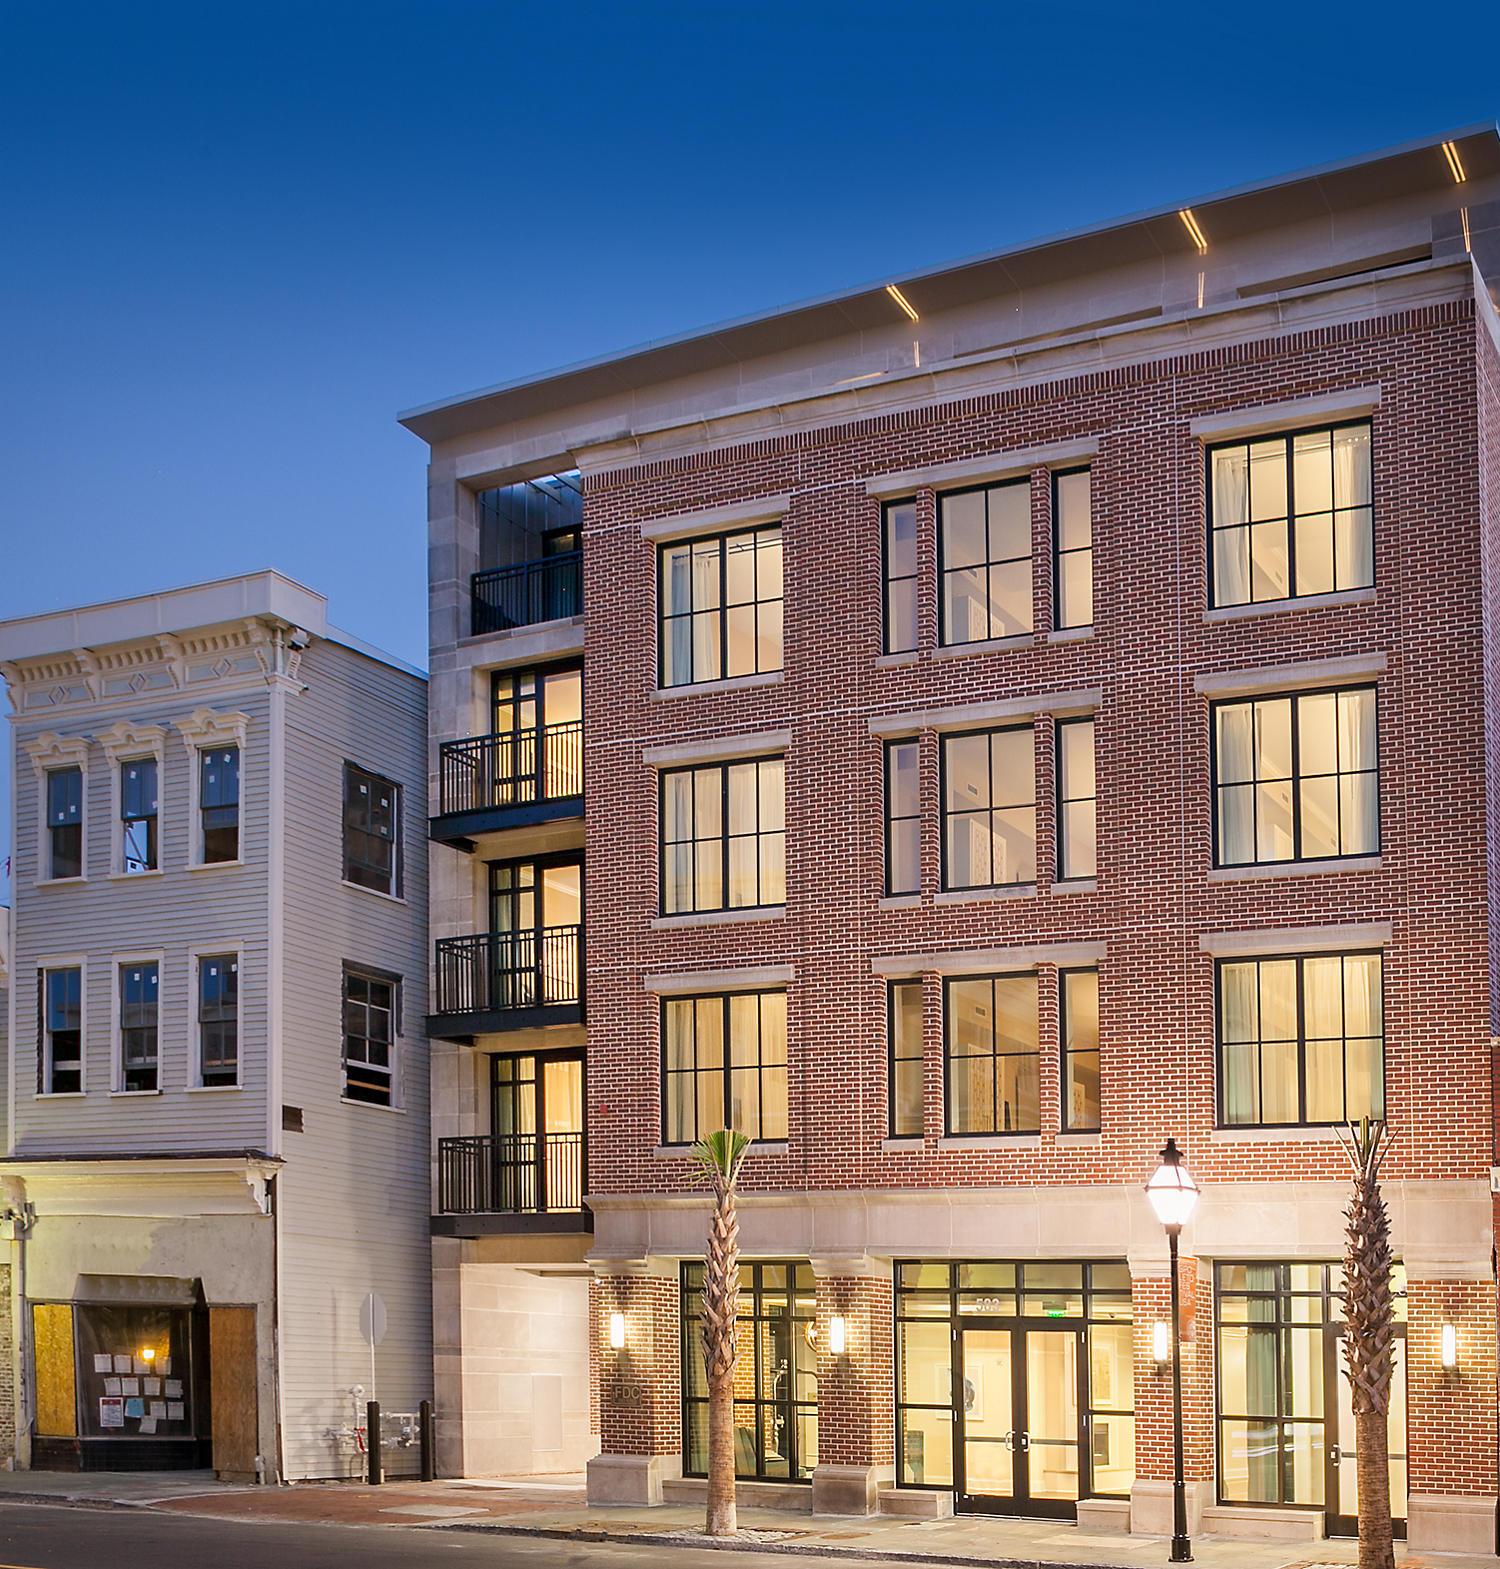 King St Charleston Sc: King 583 Resort - Charleston, South Carolina